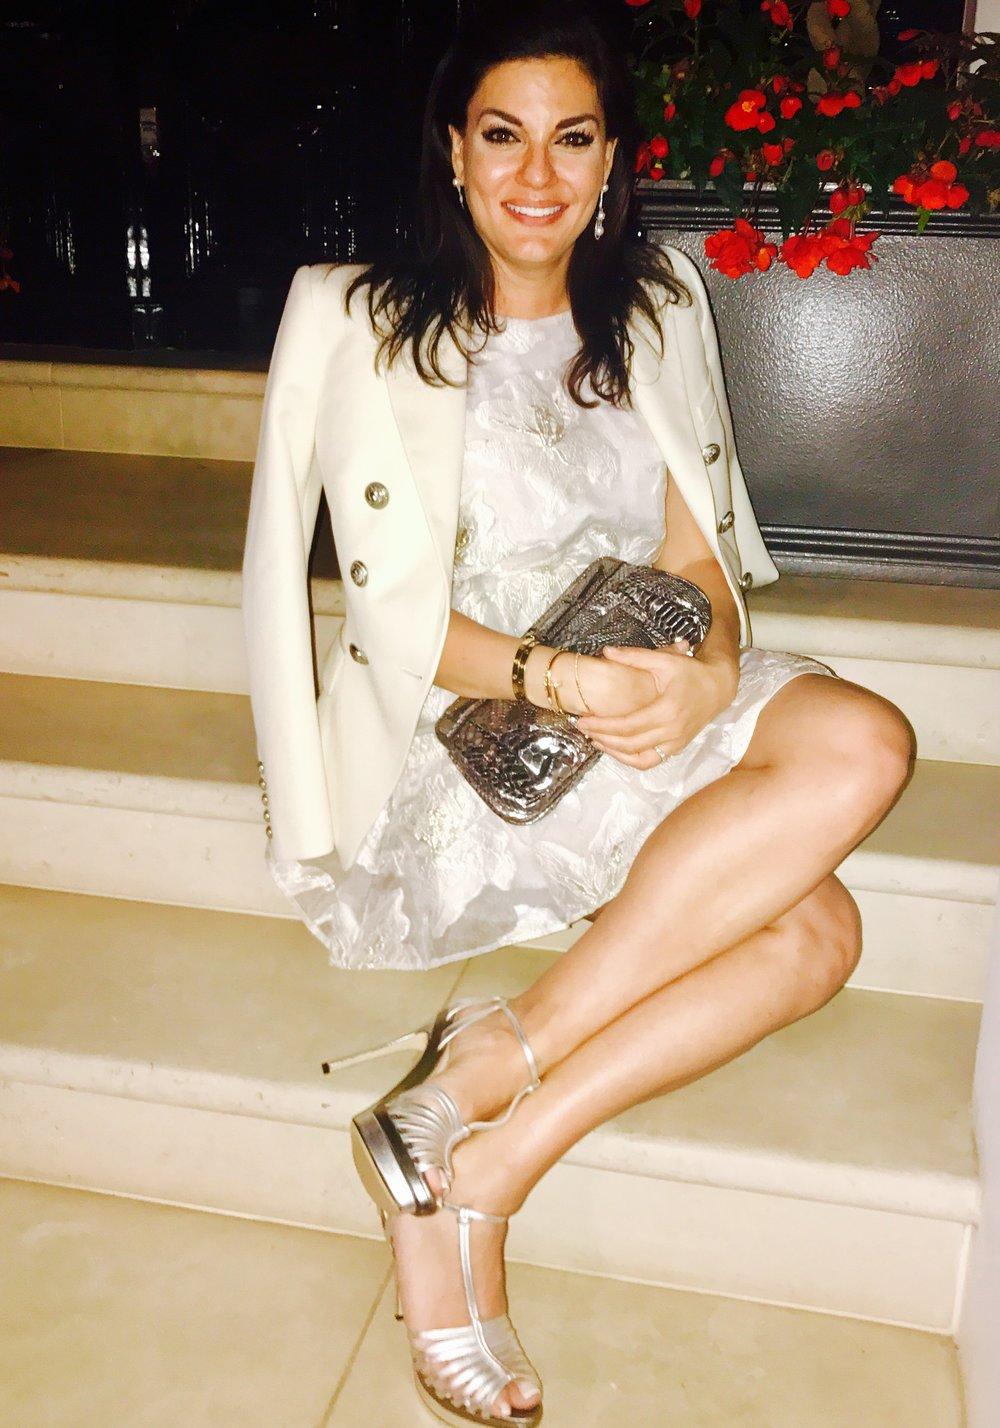 White Nights in London Wearing Balmain Blazer, Topshop Organza Floral Print Dress, Fendi Heels and Zagliani Clutch